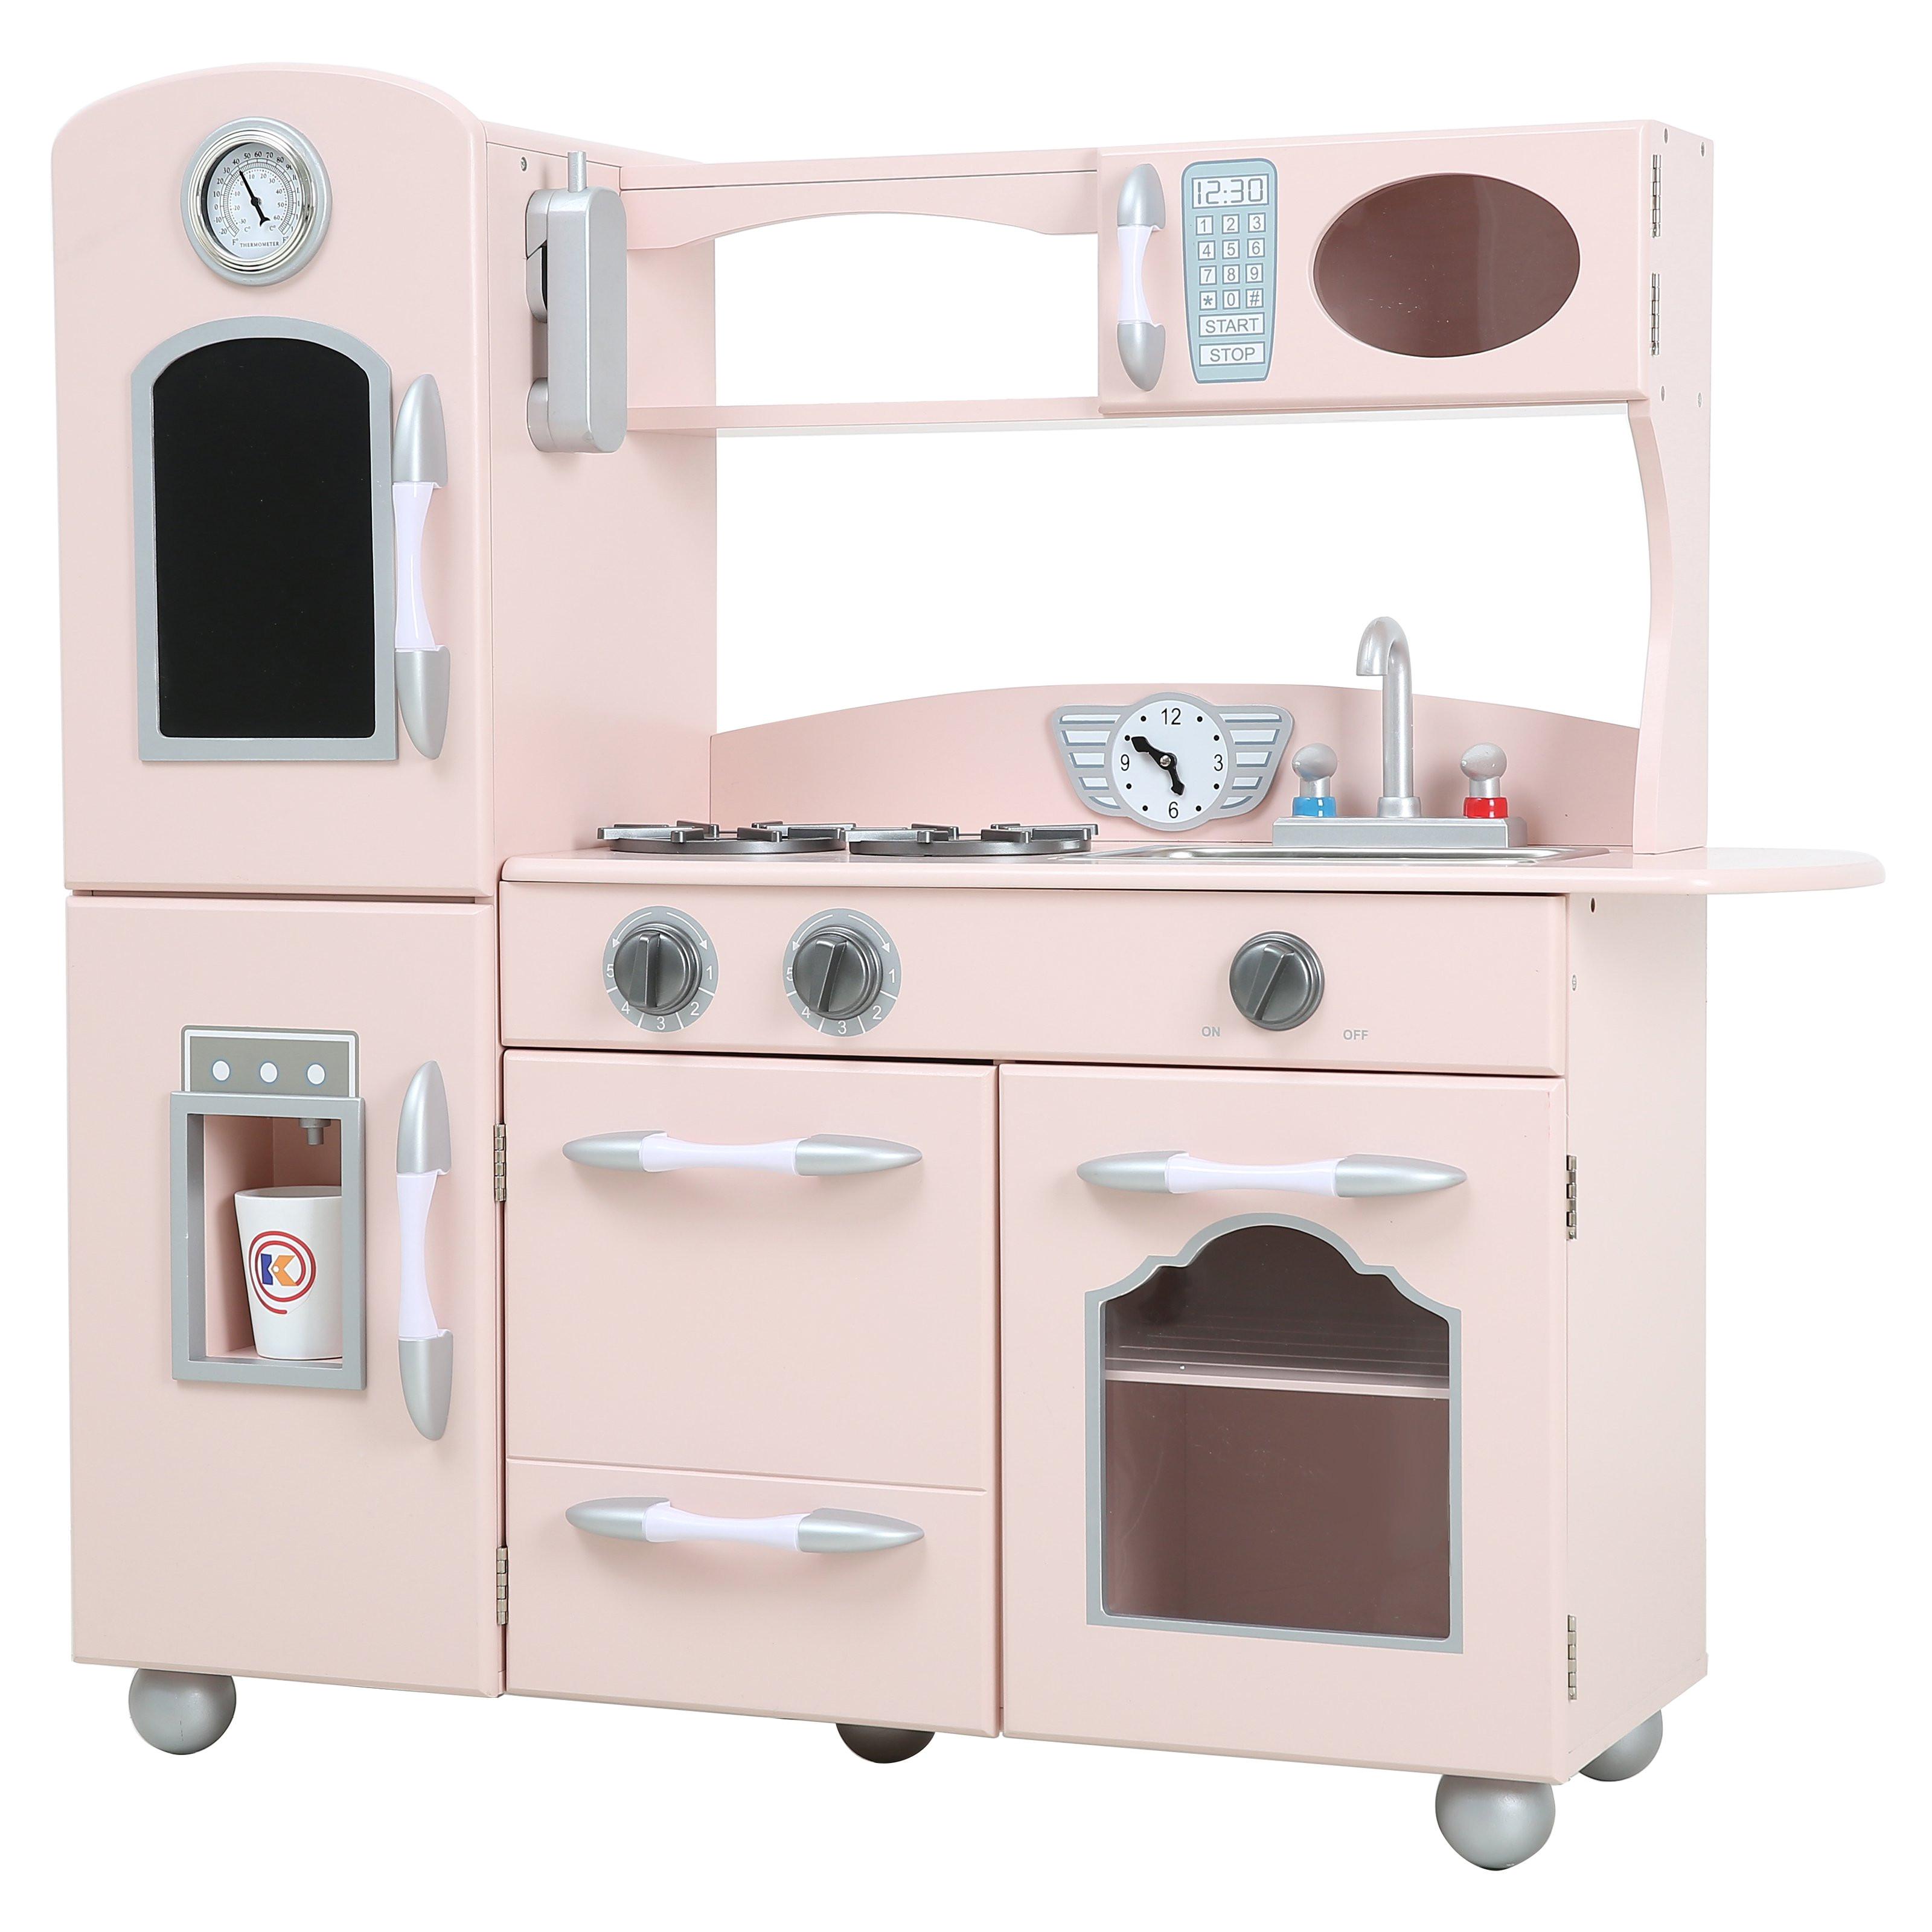 engaging imaginarium all in one wooden kitchen set in toy wood kitchen